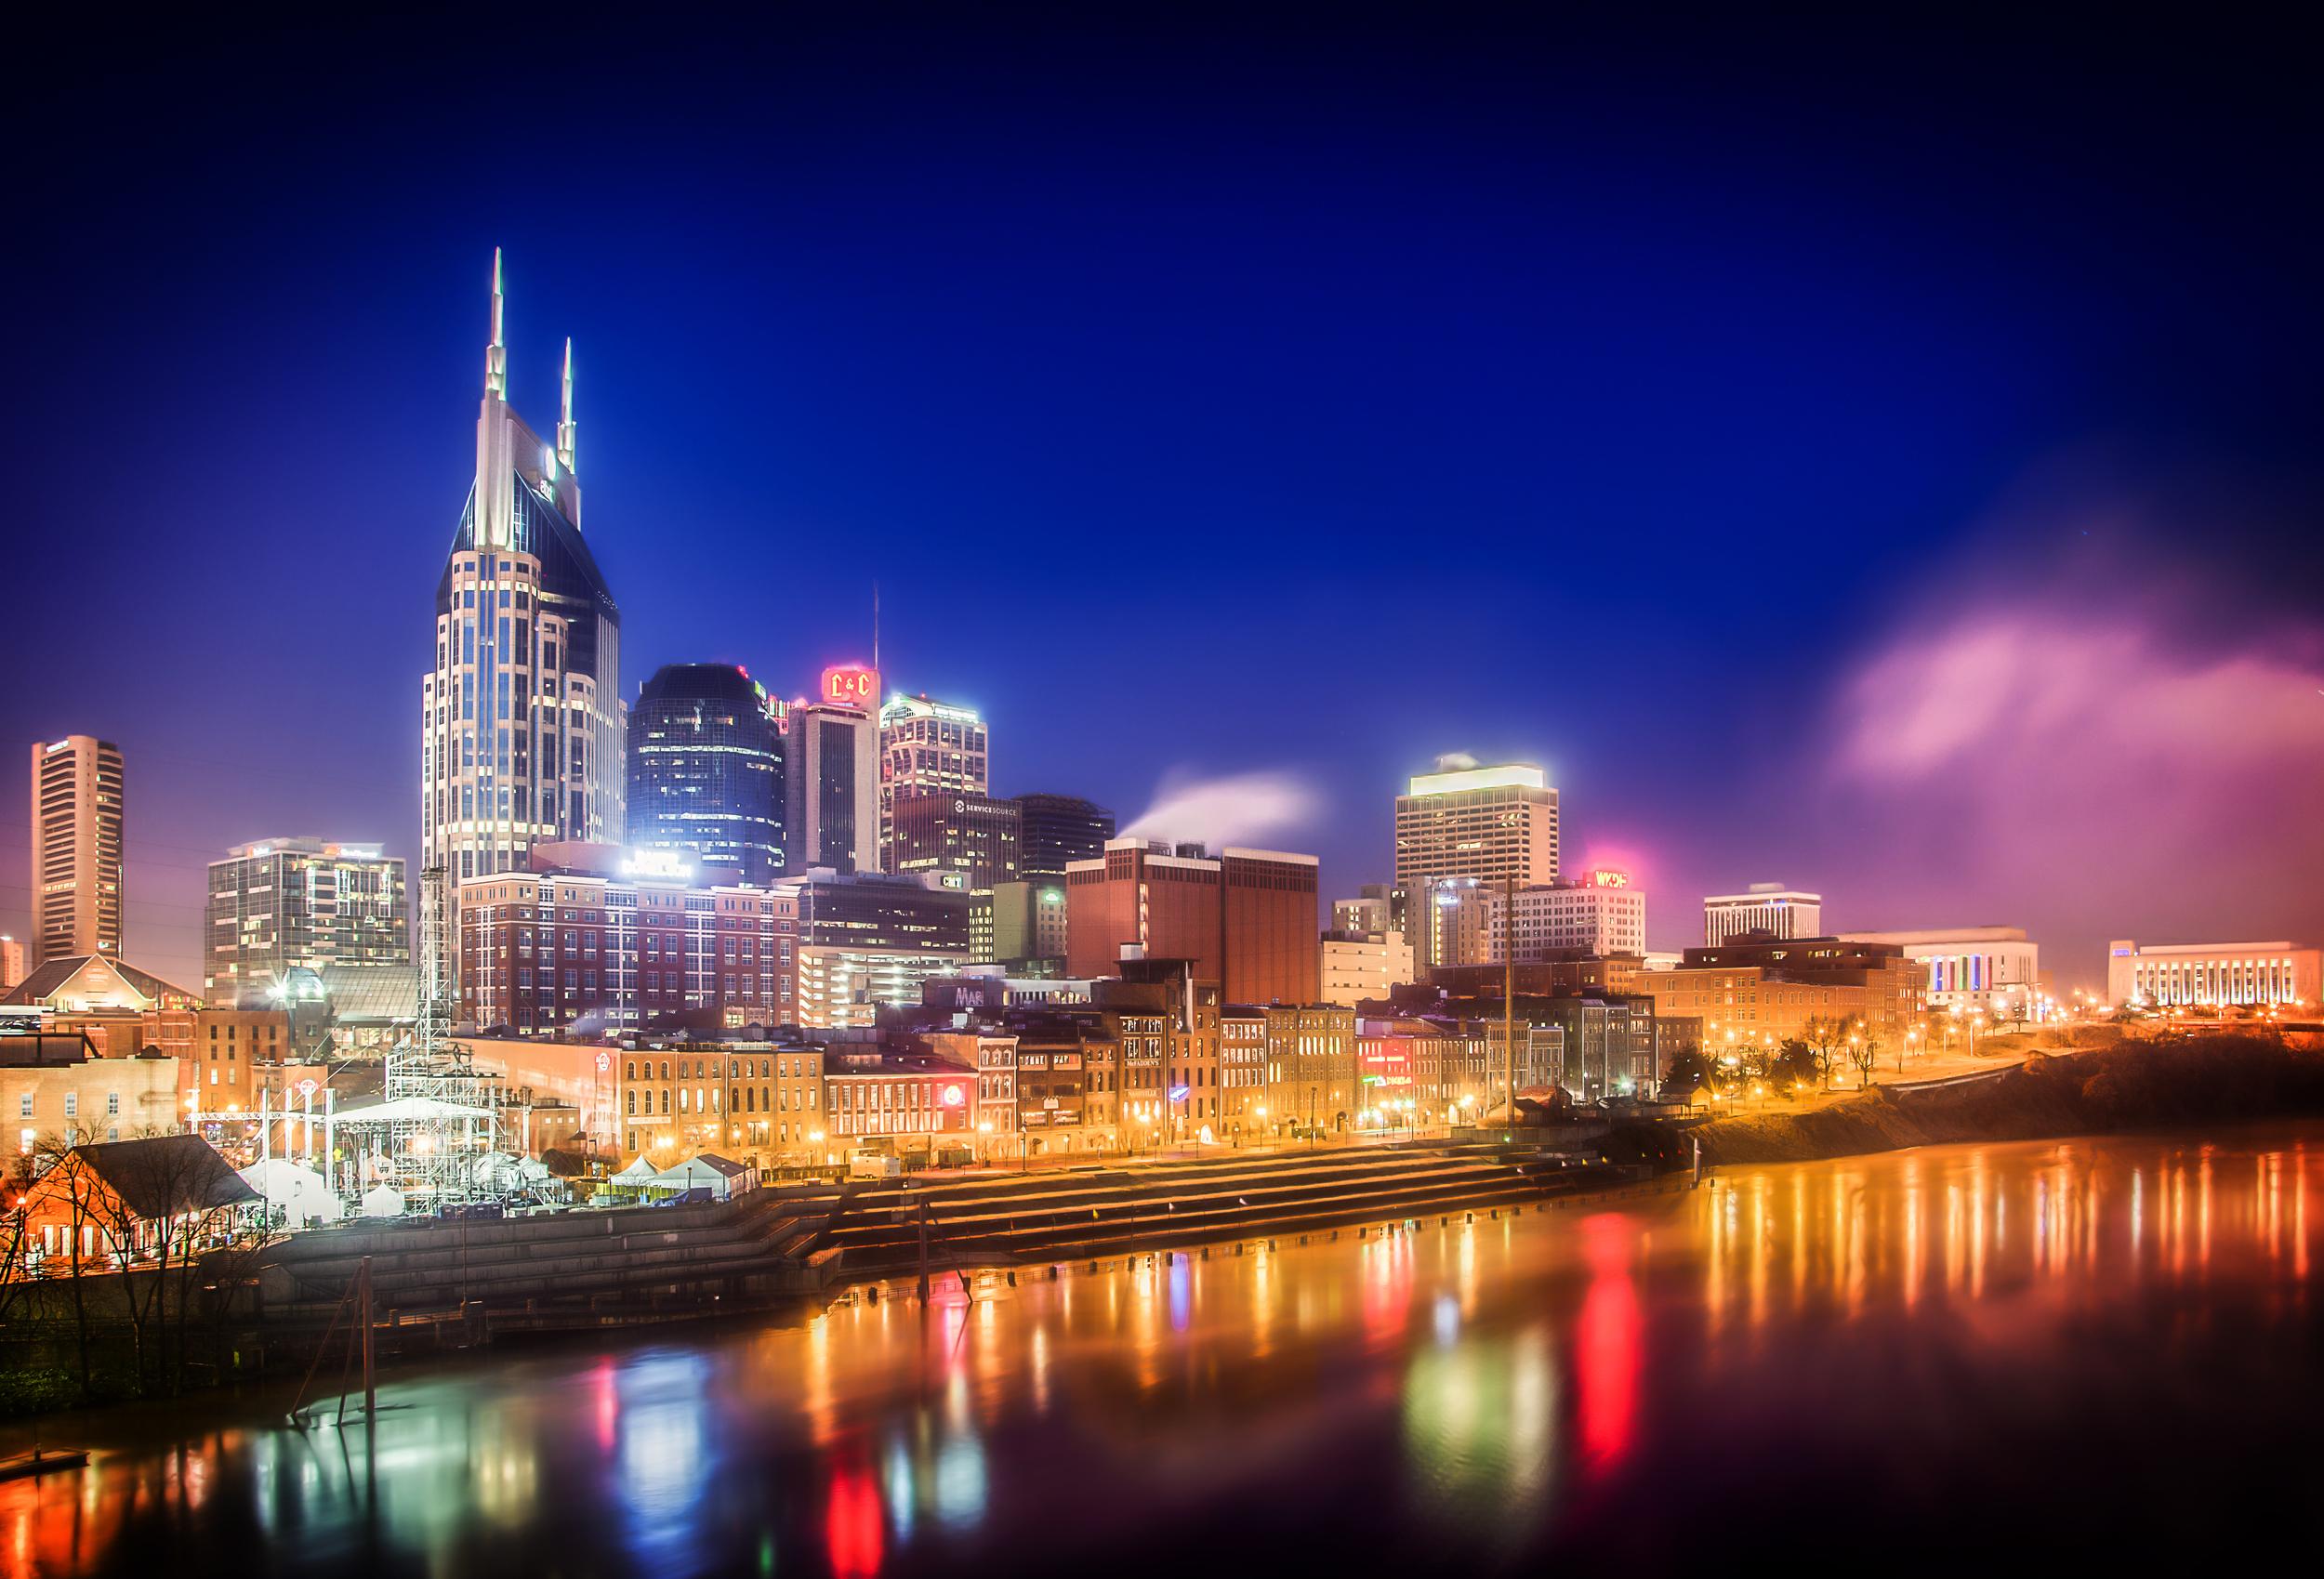 This is a shot of the Nashville Skyline from the pedestrian bridge. Nashville, TN January 1, 2014